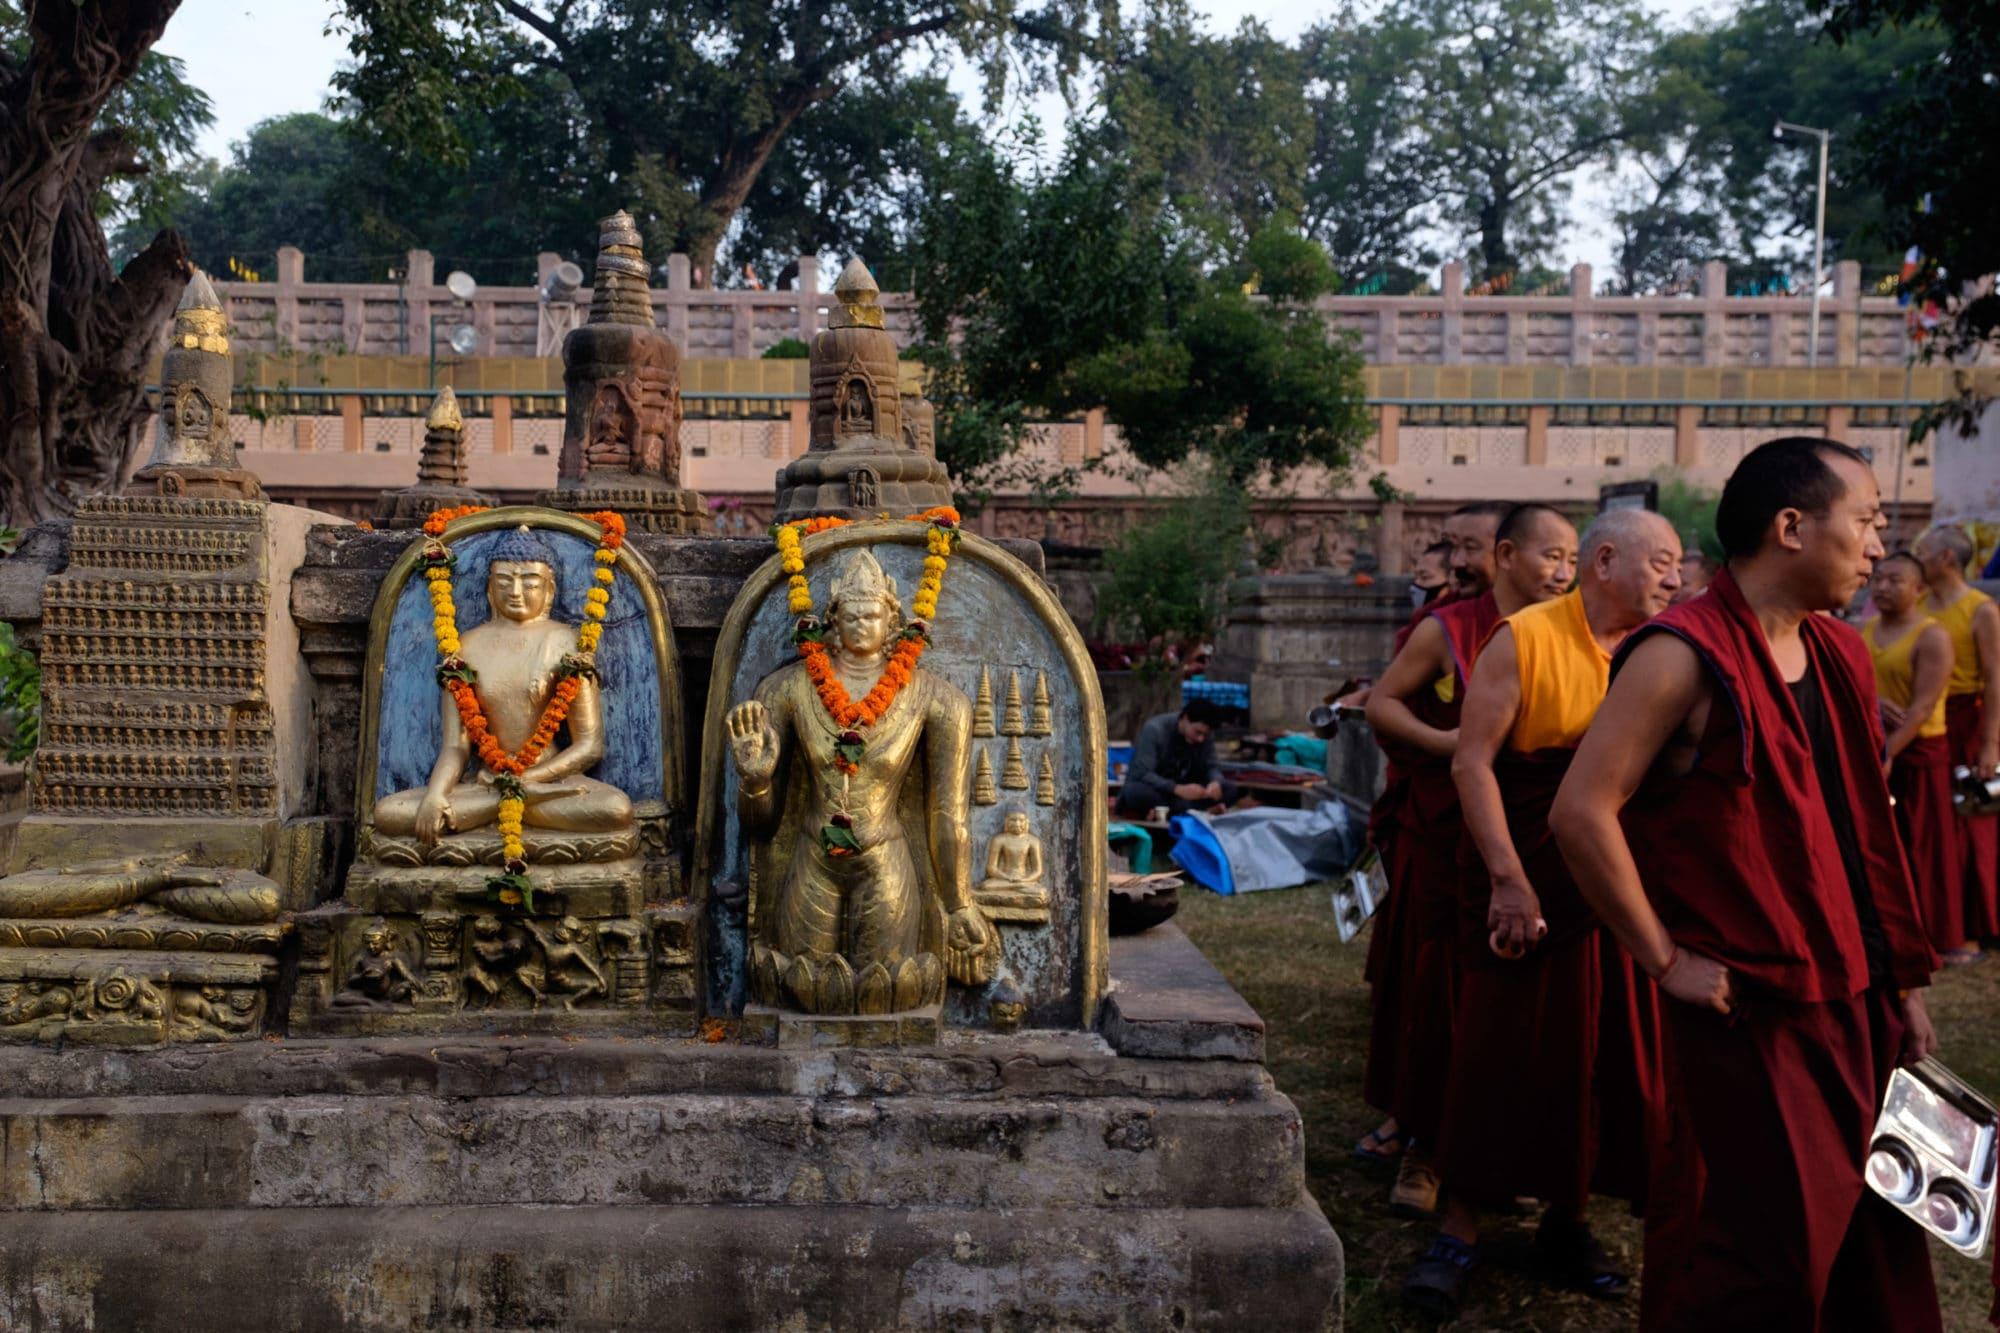 Bodhyaga Mahabodhi Temple